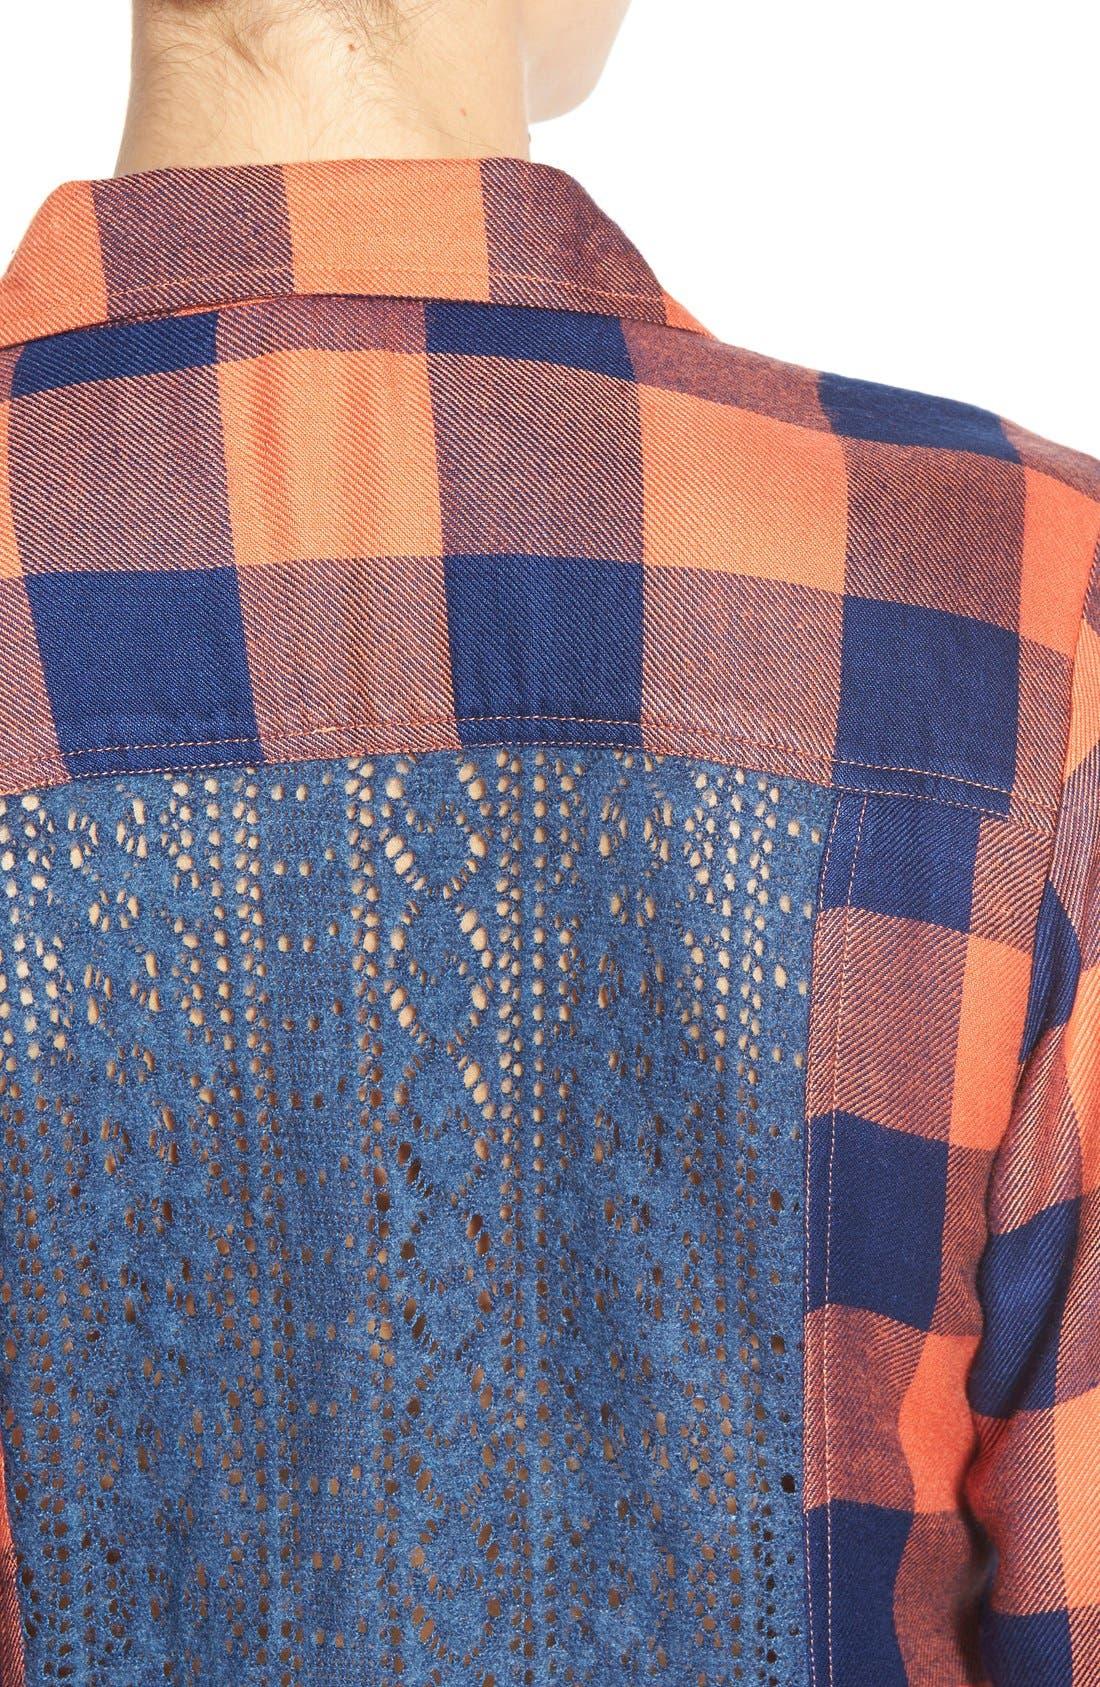 Alternate Image 4  - Rip Curl 'Dweller' Lace Back Flannel Shirt